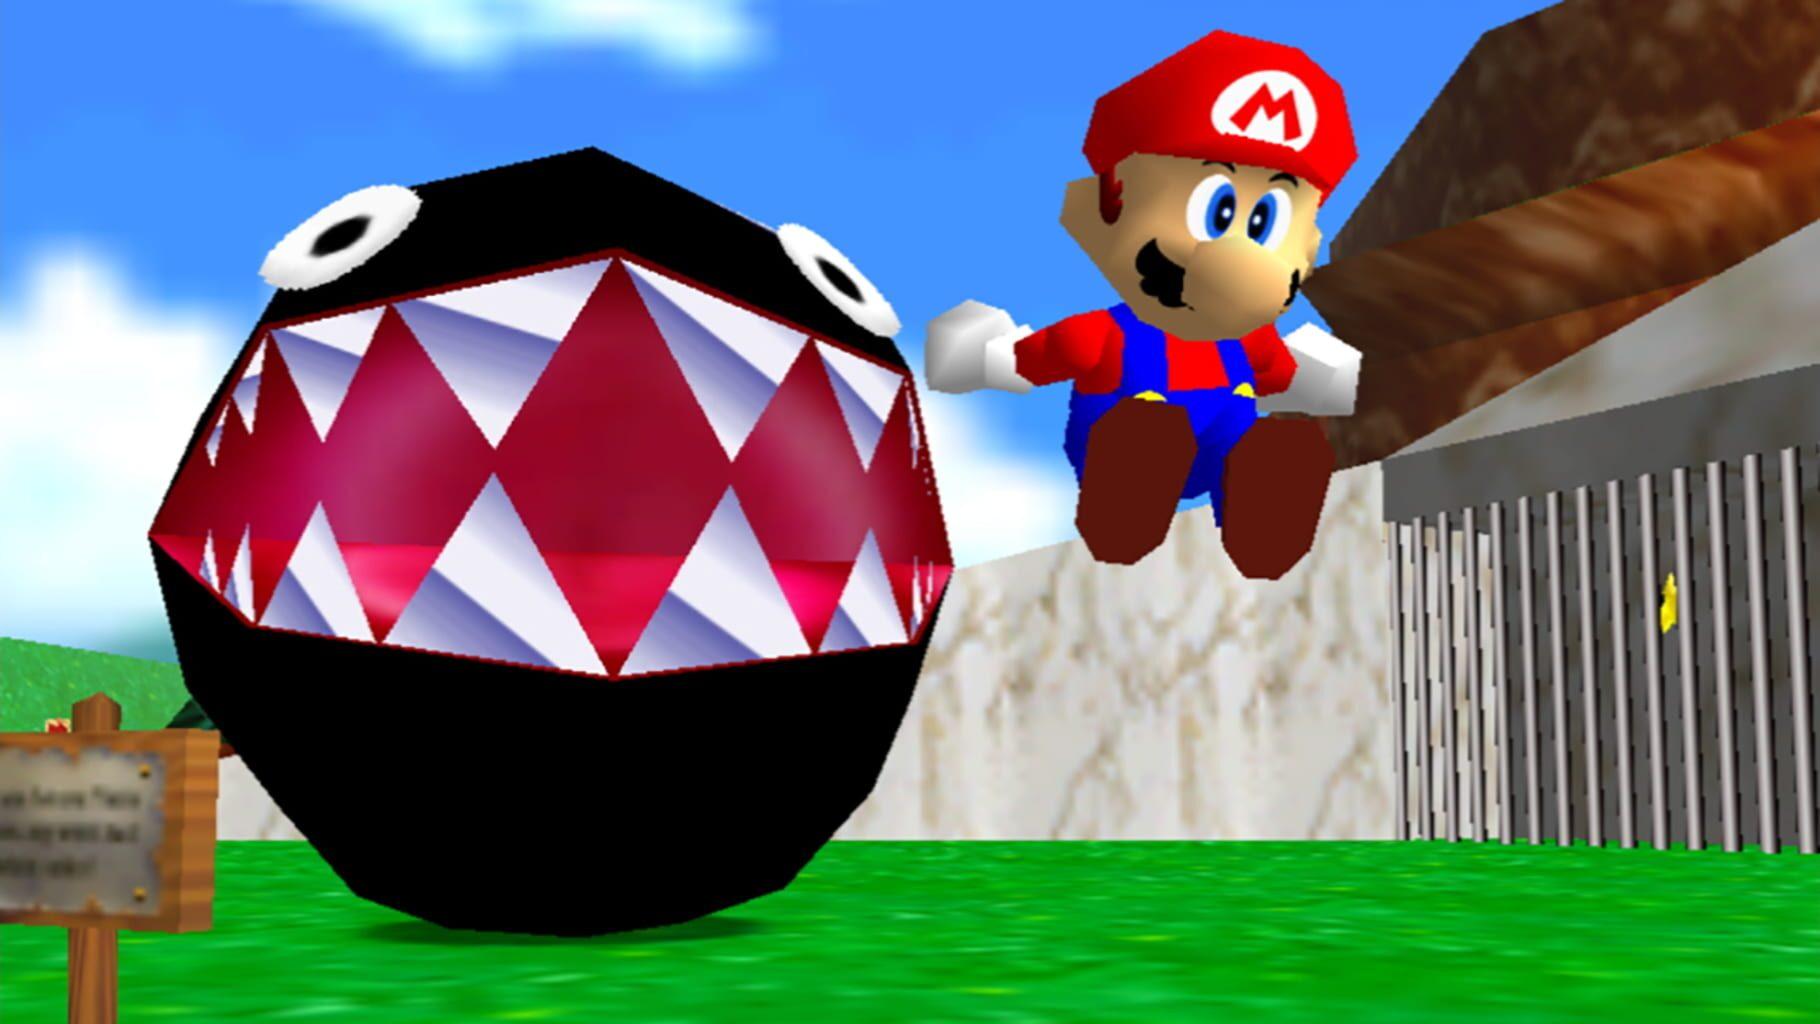 Gameplay Screenshot from Super Mario 3D All-Stars